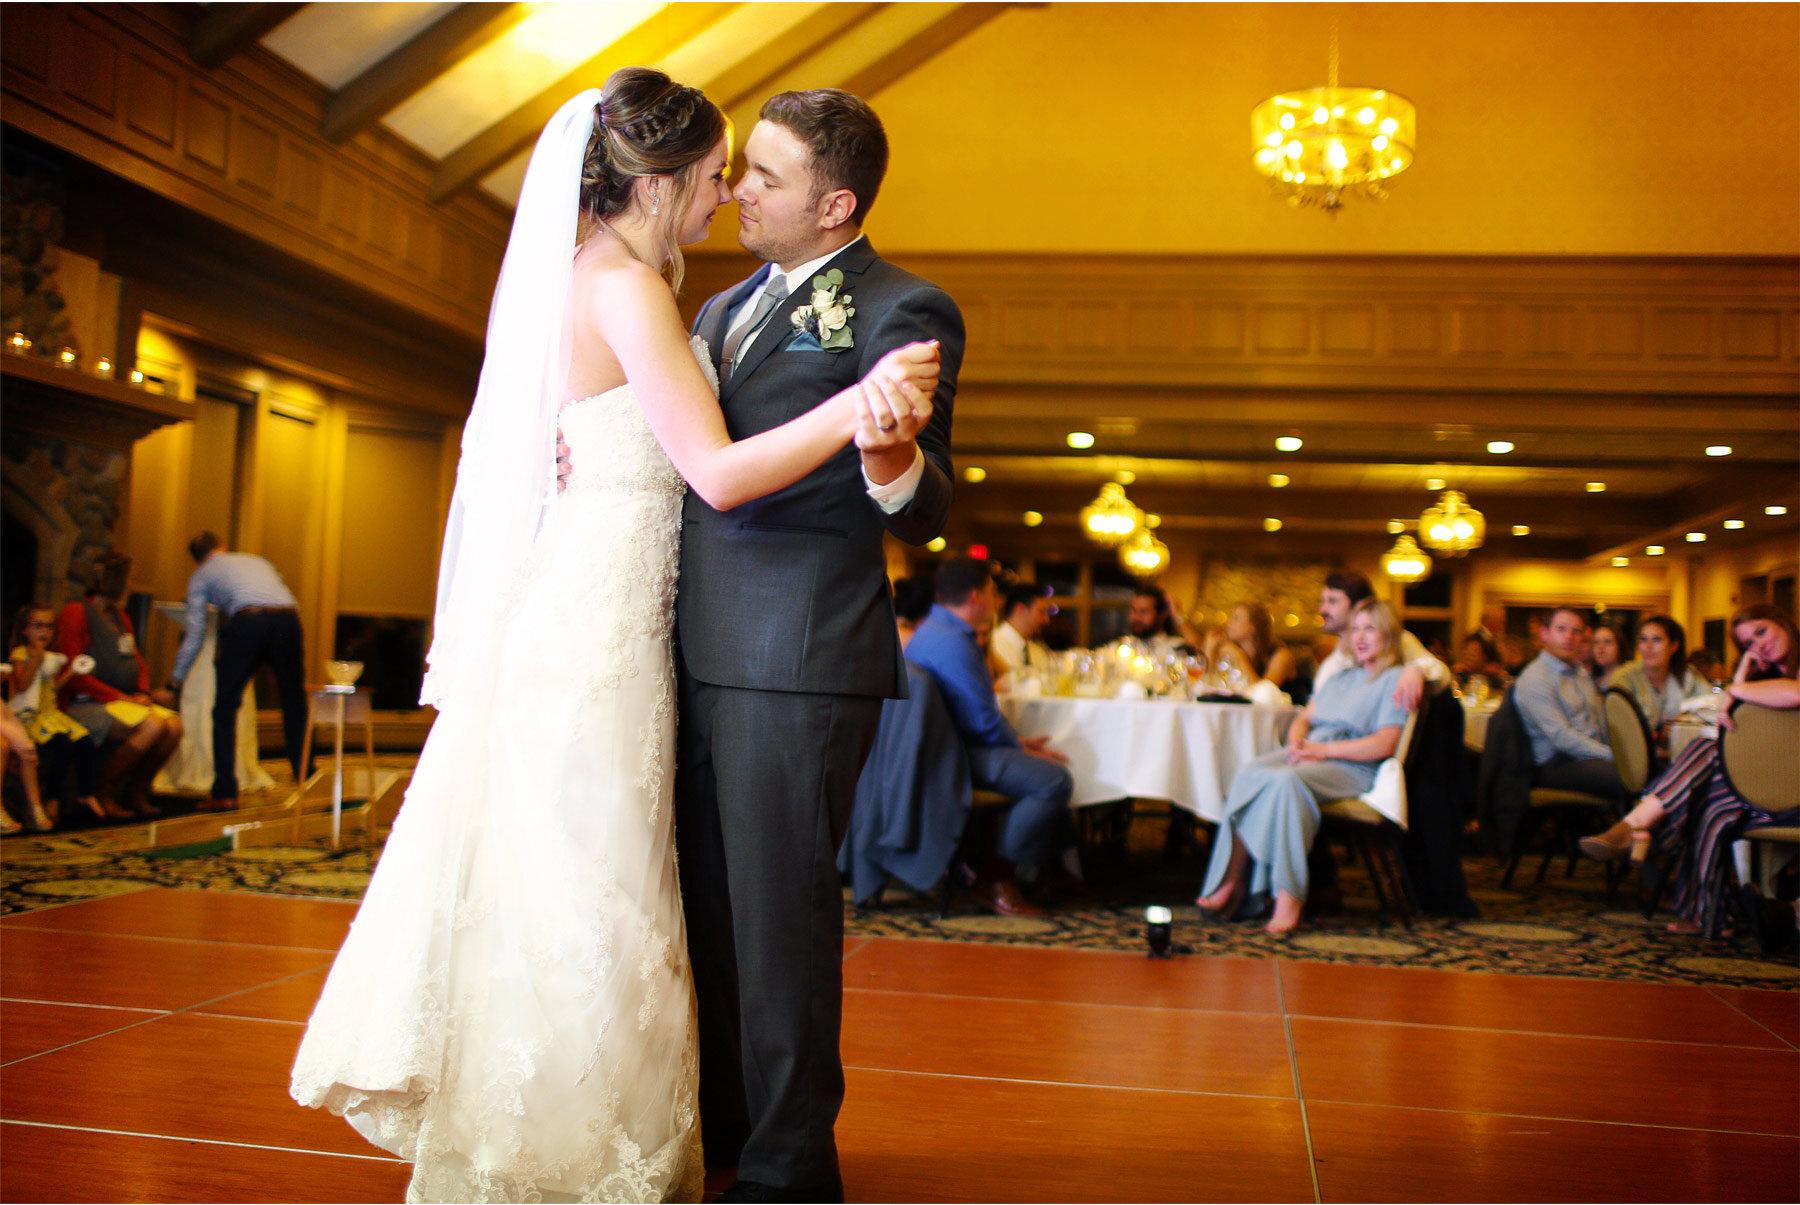 18-Vick-Photography-Minneapolis-Minnesota-Wedding-Rush-Creek-Golf-Club-Reception-Dance-Amanda-and-Michael.jpg